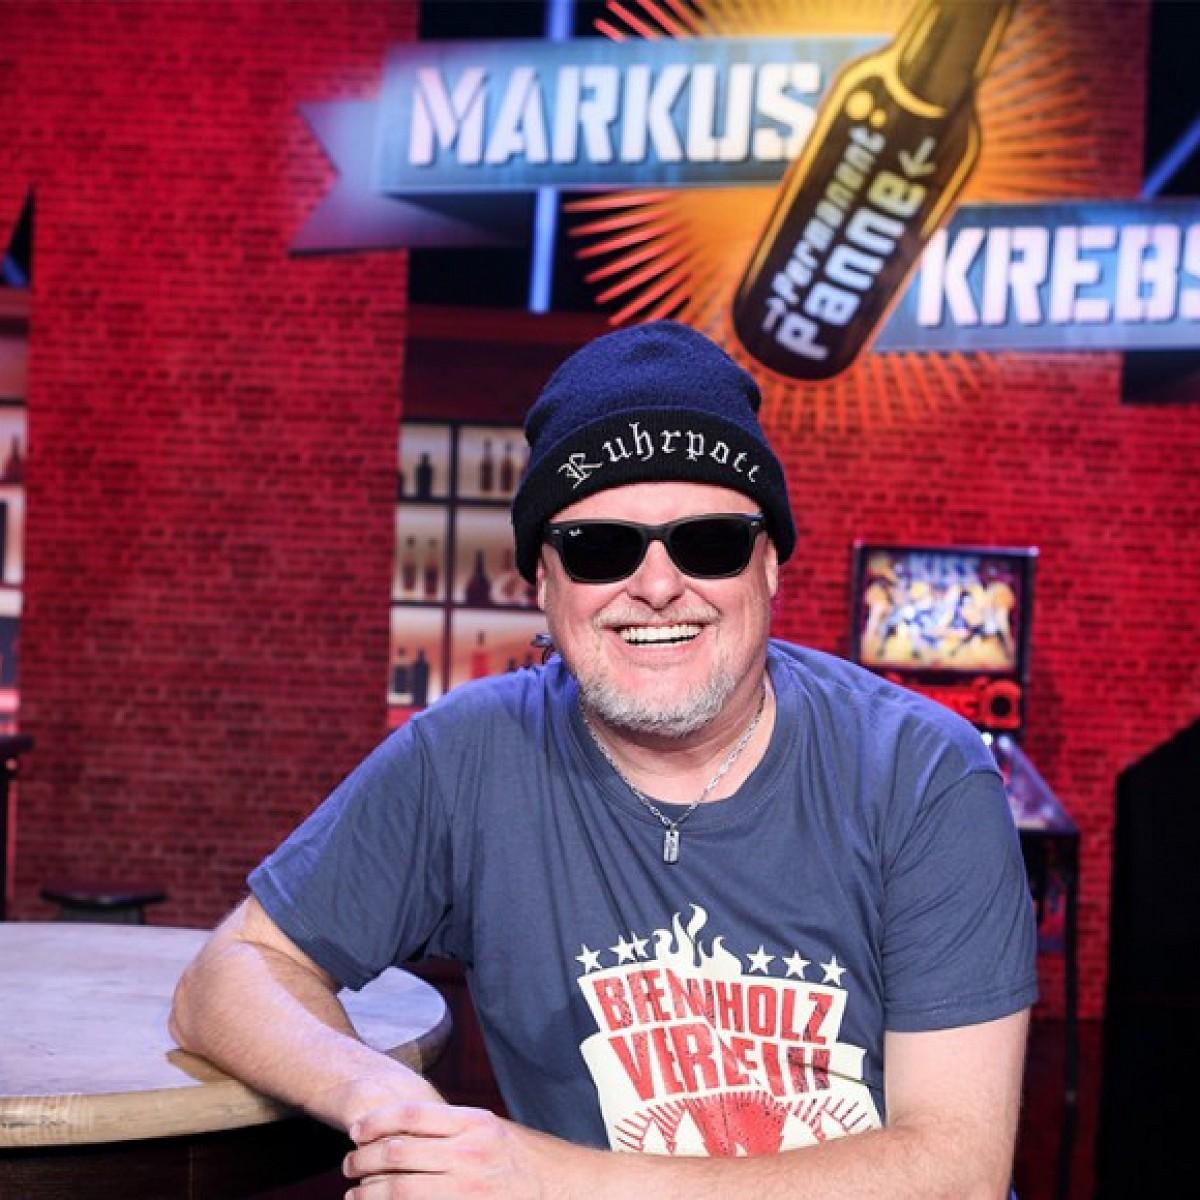 Markus Krebs Witzearena